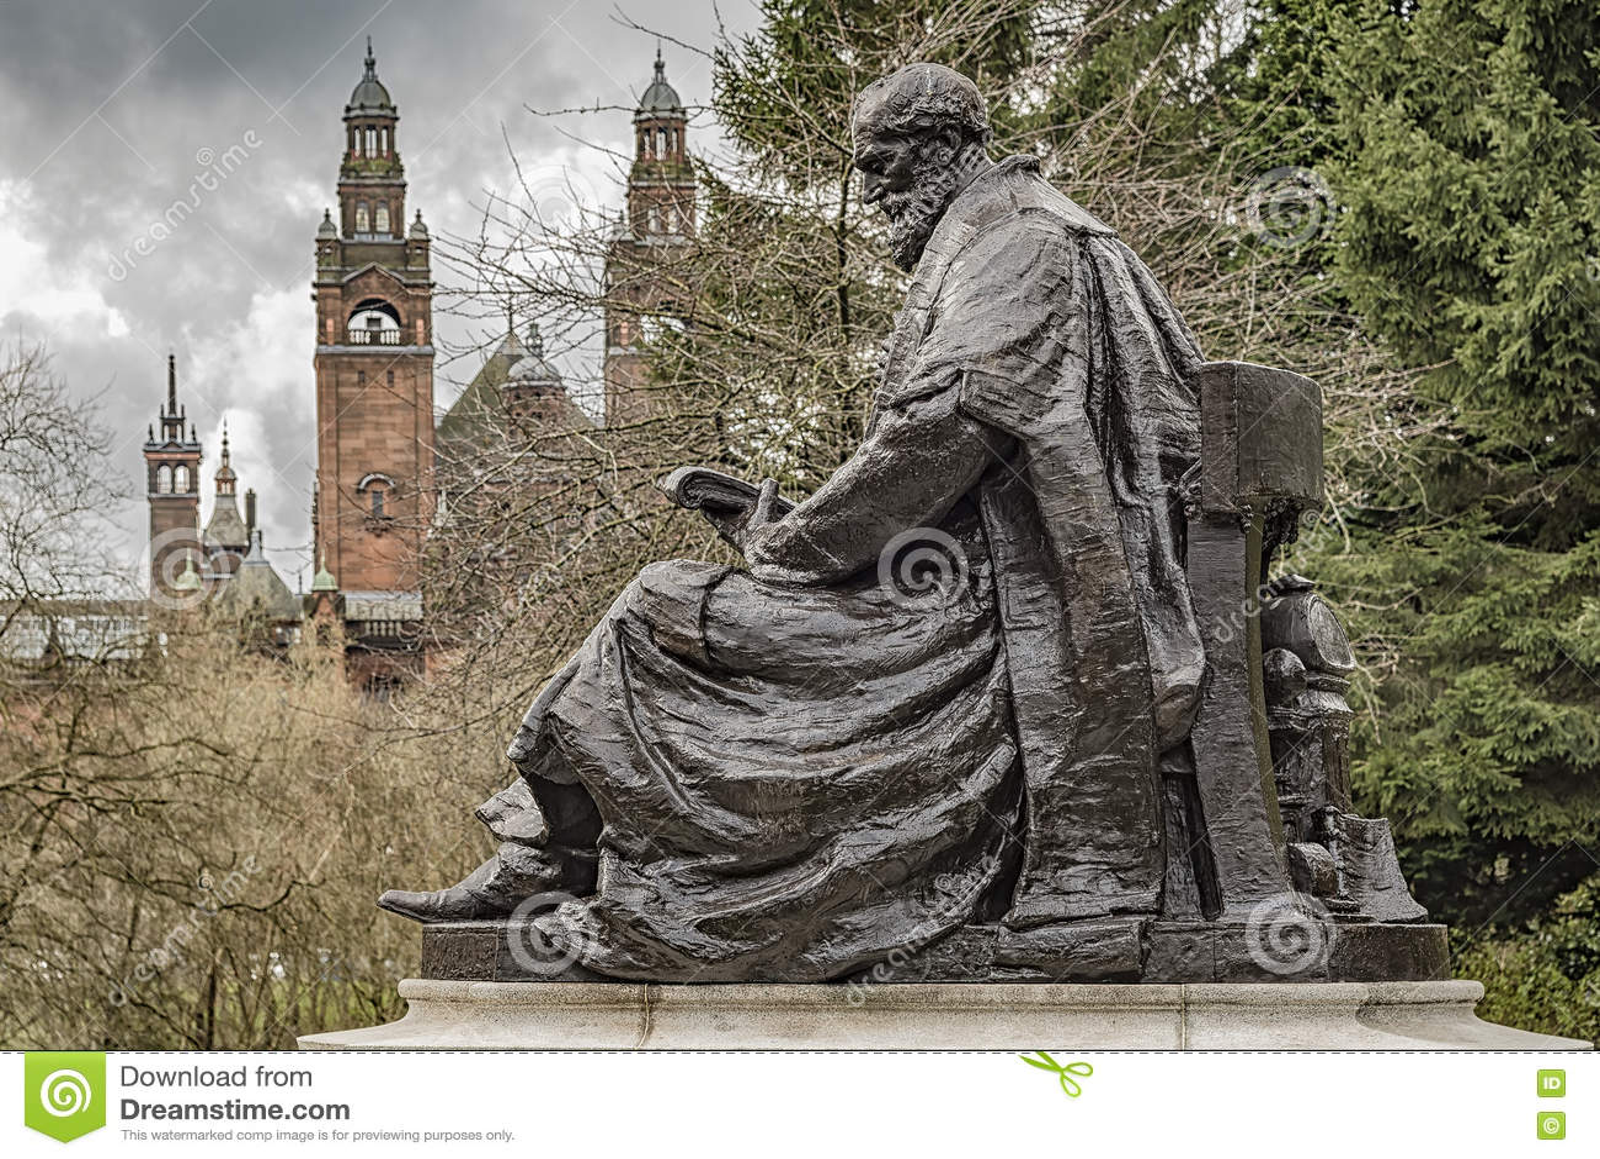 Lord Kelvin Statue